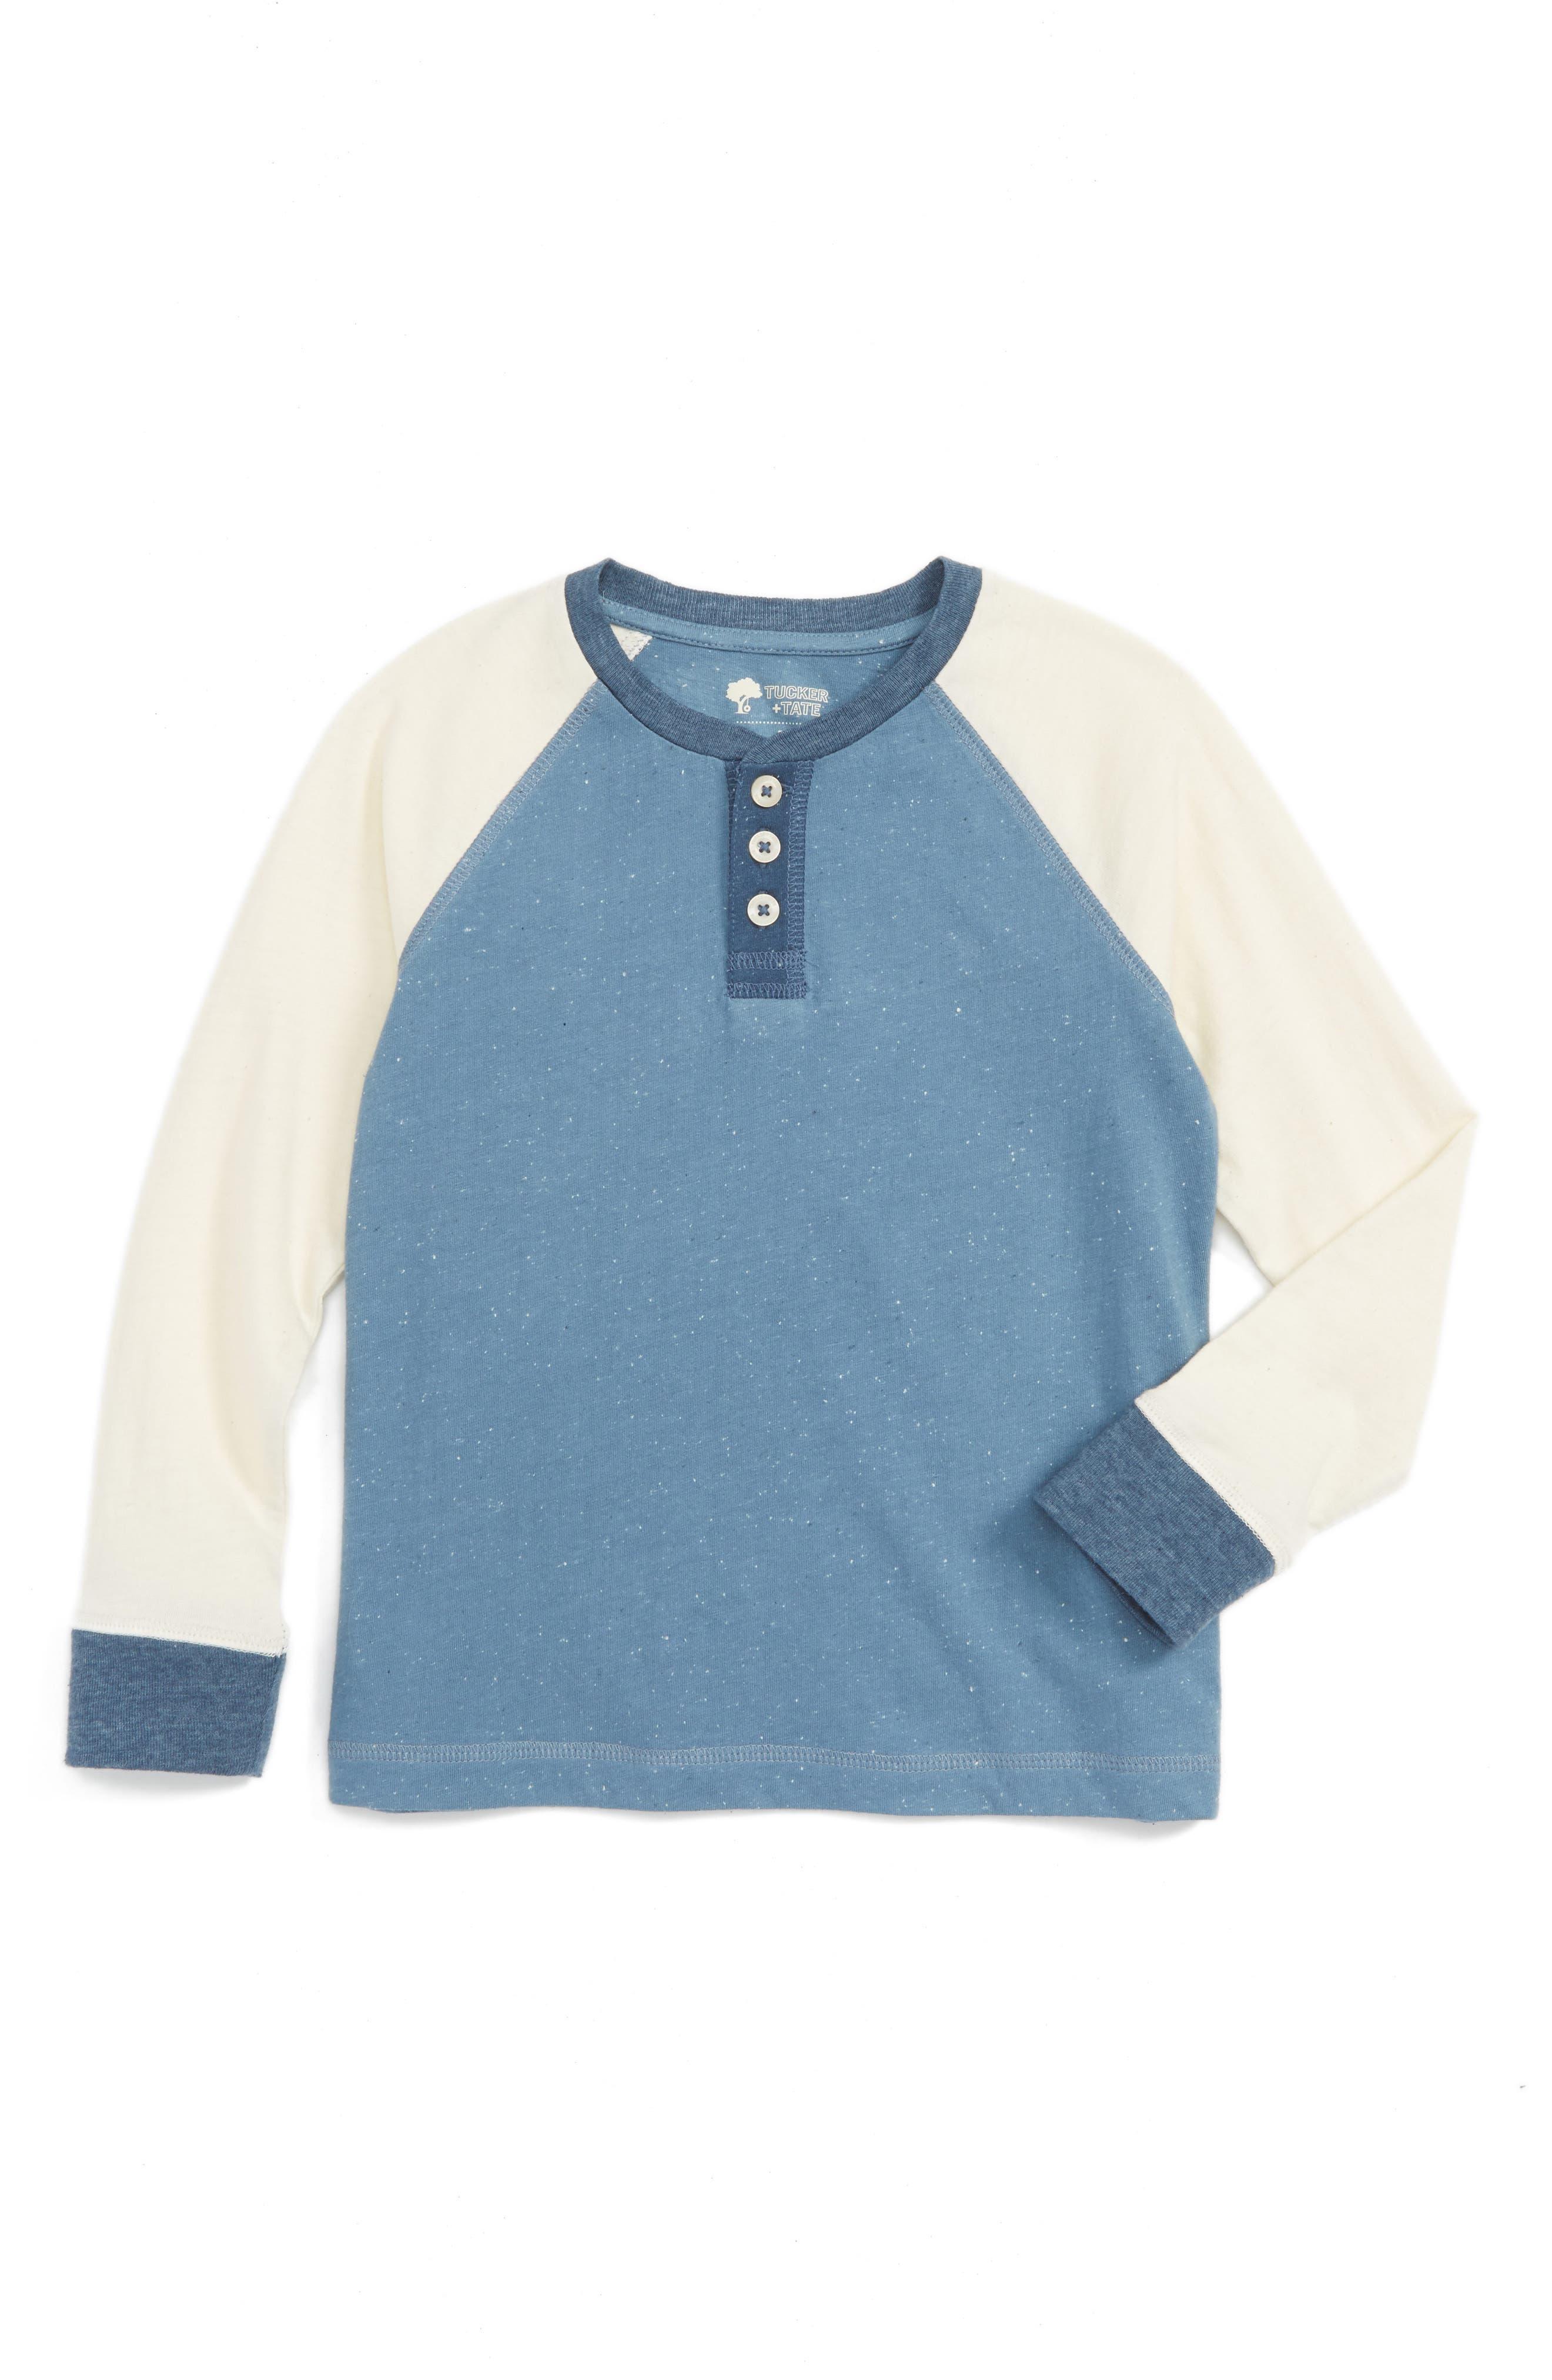 Tucker + Tate Colorblock Henley T-Shirt (Toddler Boys & Little Boys)